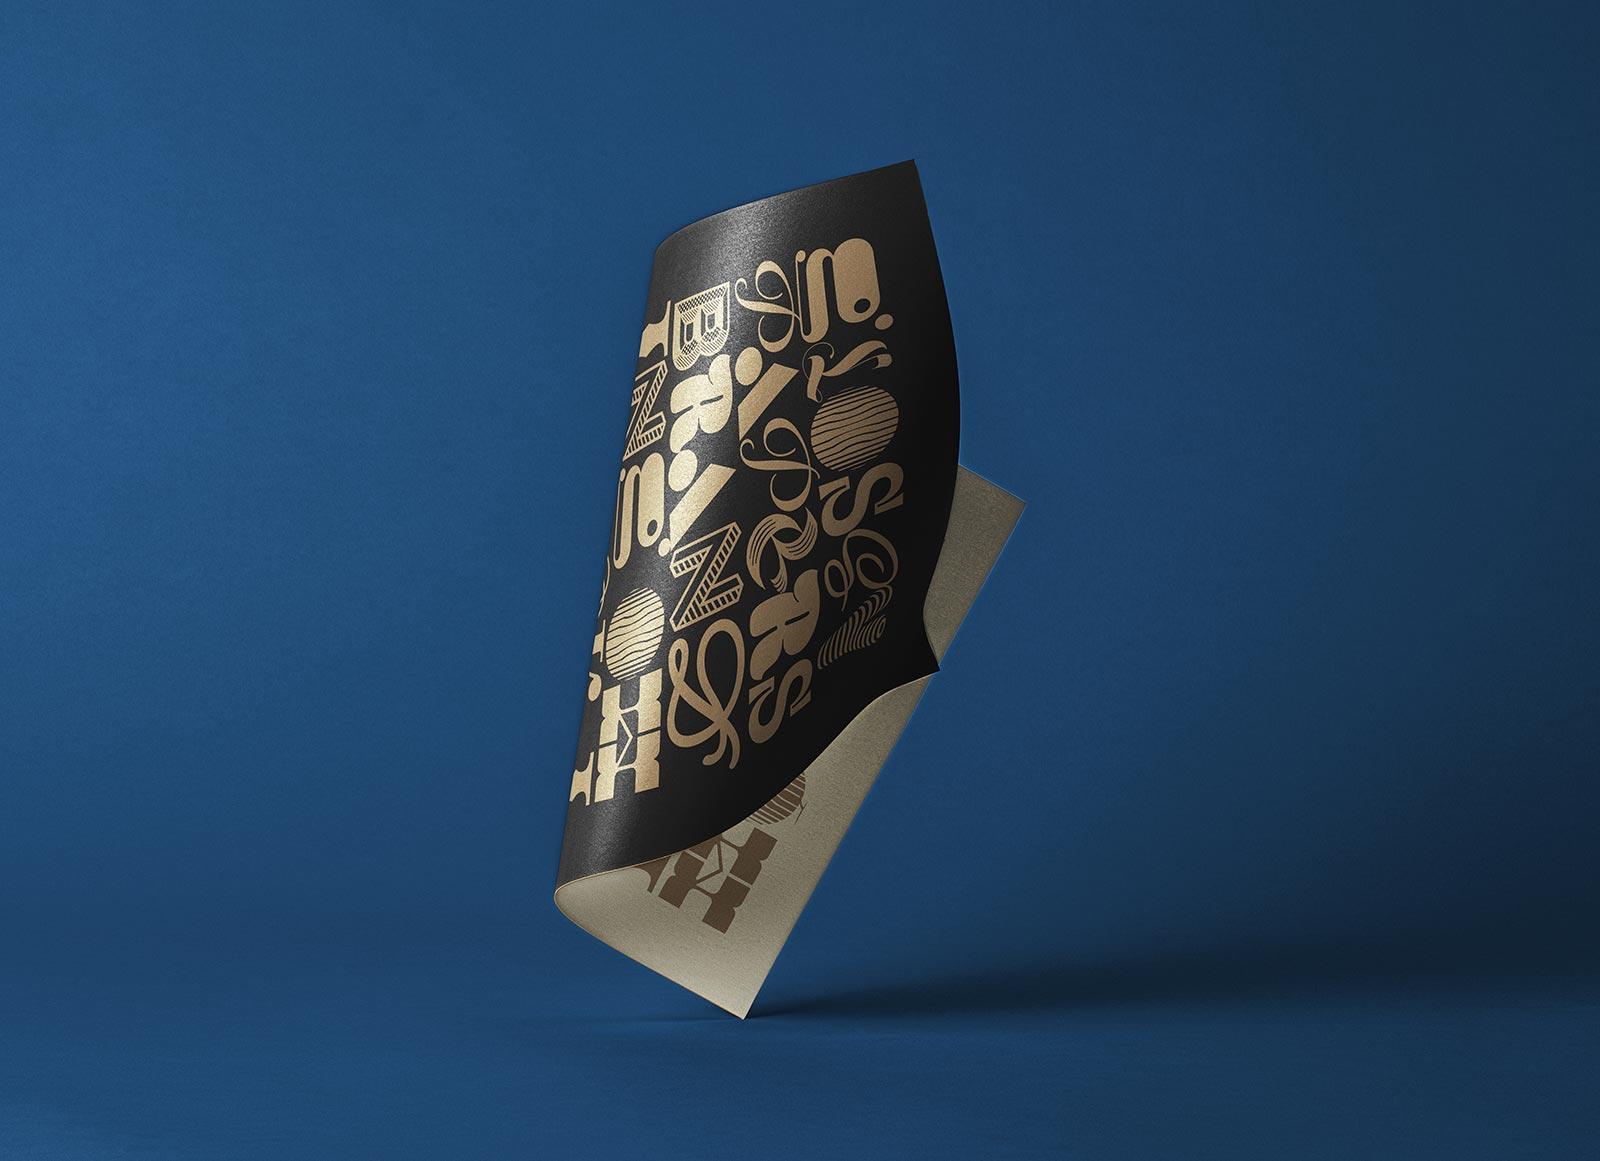 Free-Folded-Glossy-Paper-Branding-Mockup-PSD